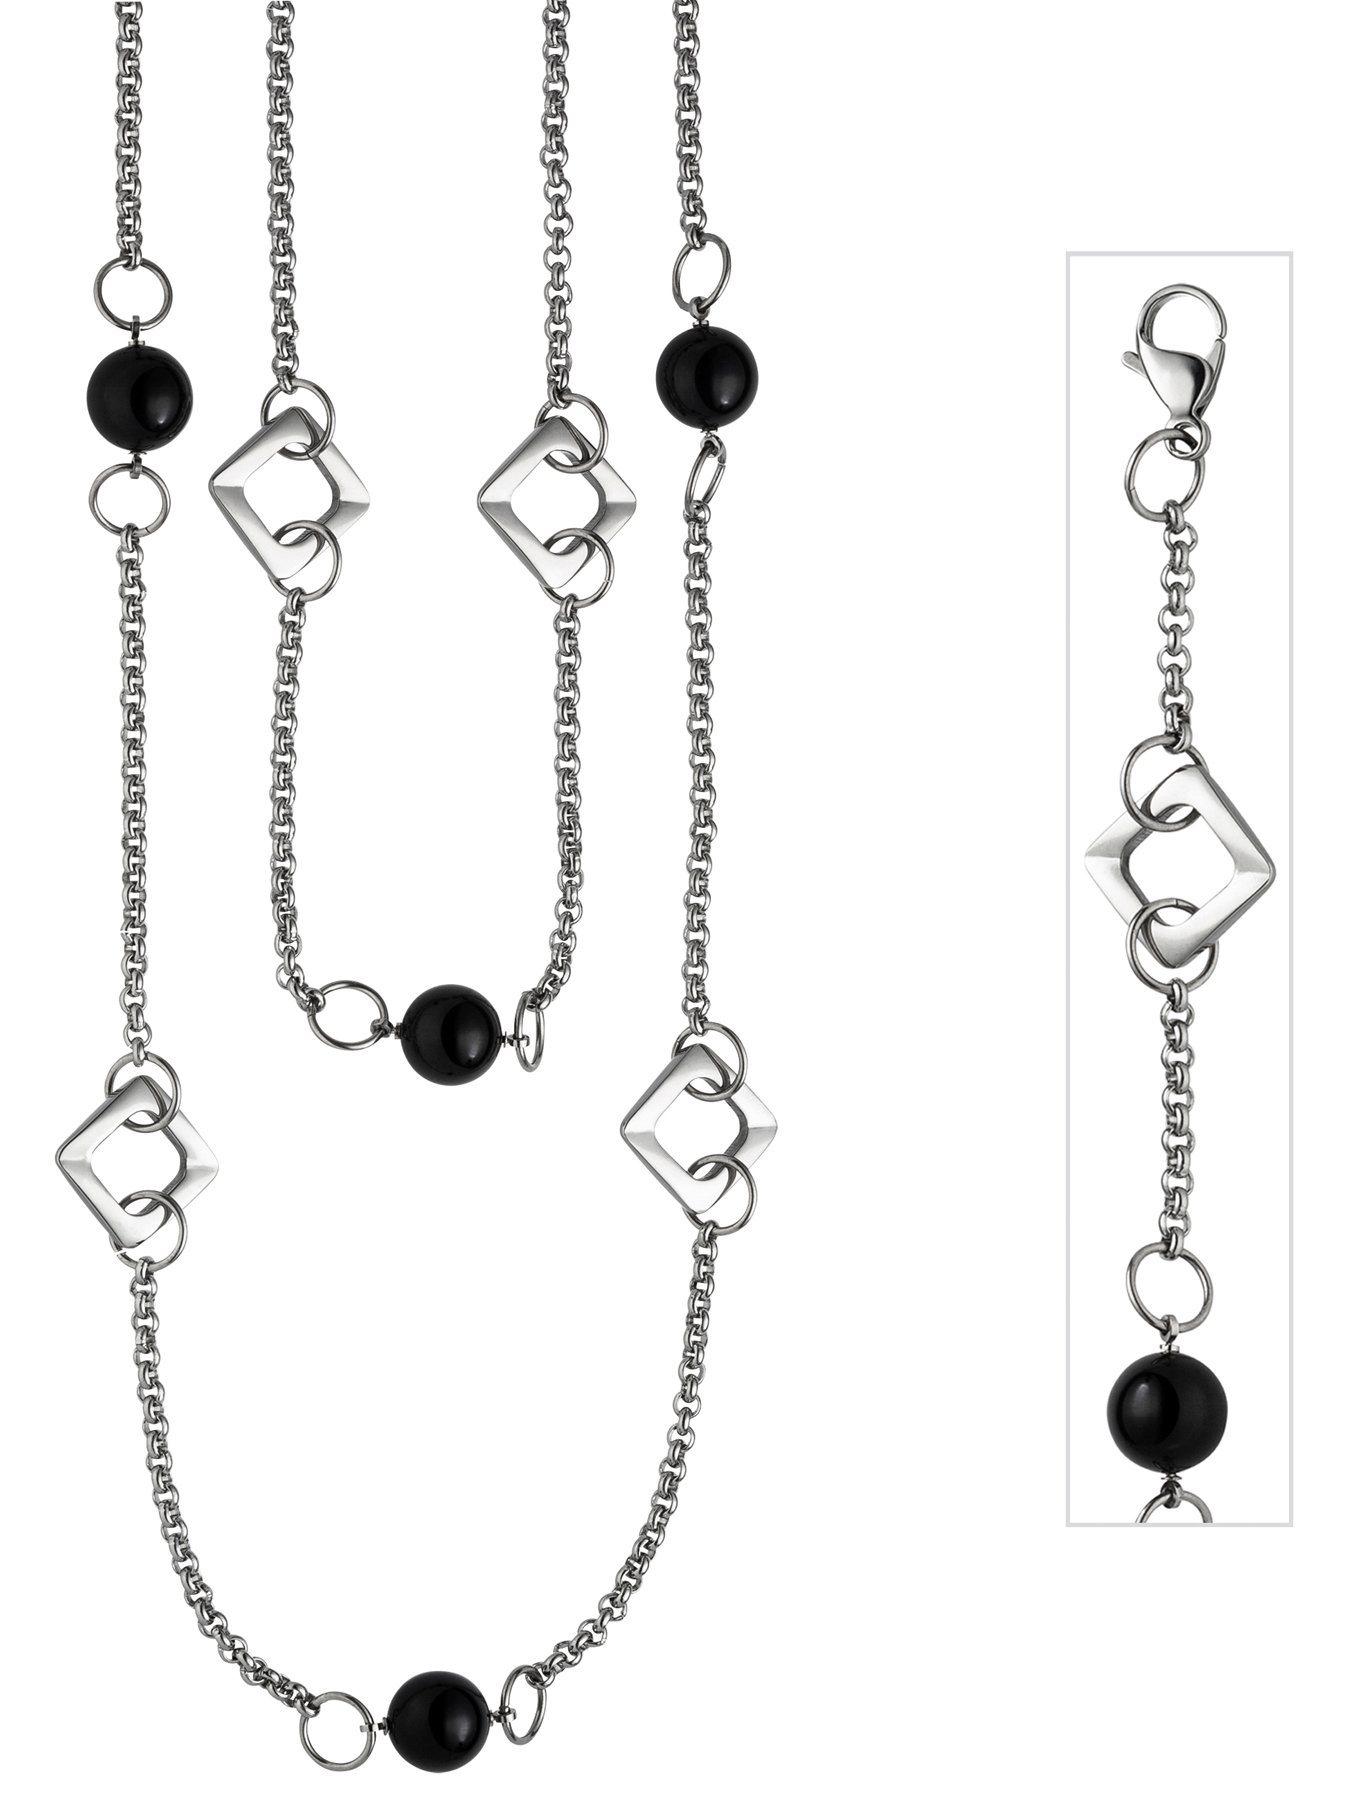 Adelia´s Kette ohne Anhänger Edelstahl mit Achat L - 55 cm | Schmuck > Halsketten > Ketten ohne Anhänger | Adelia´s